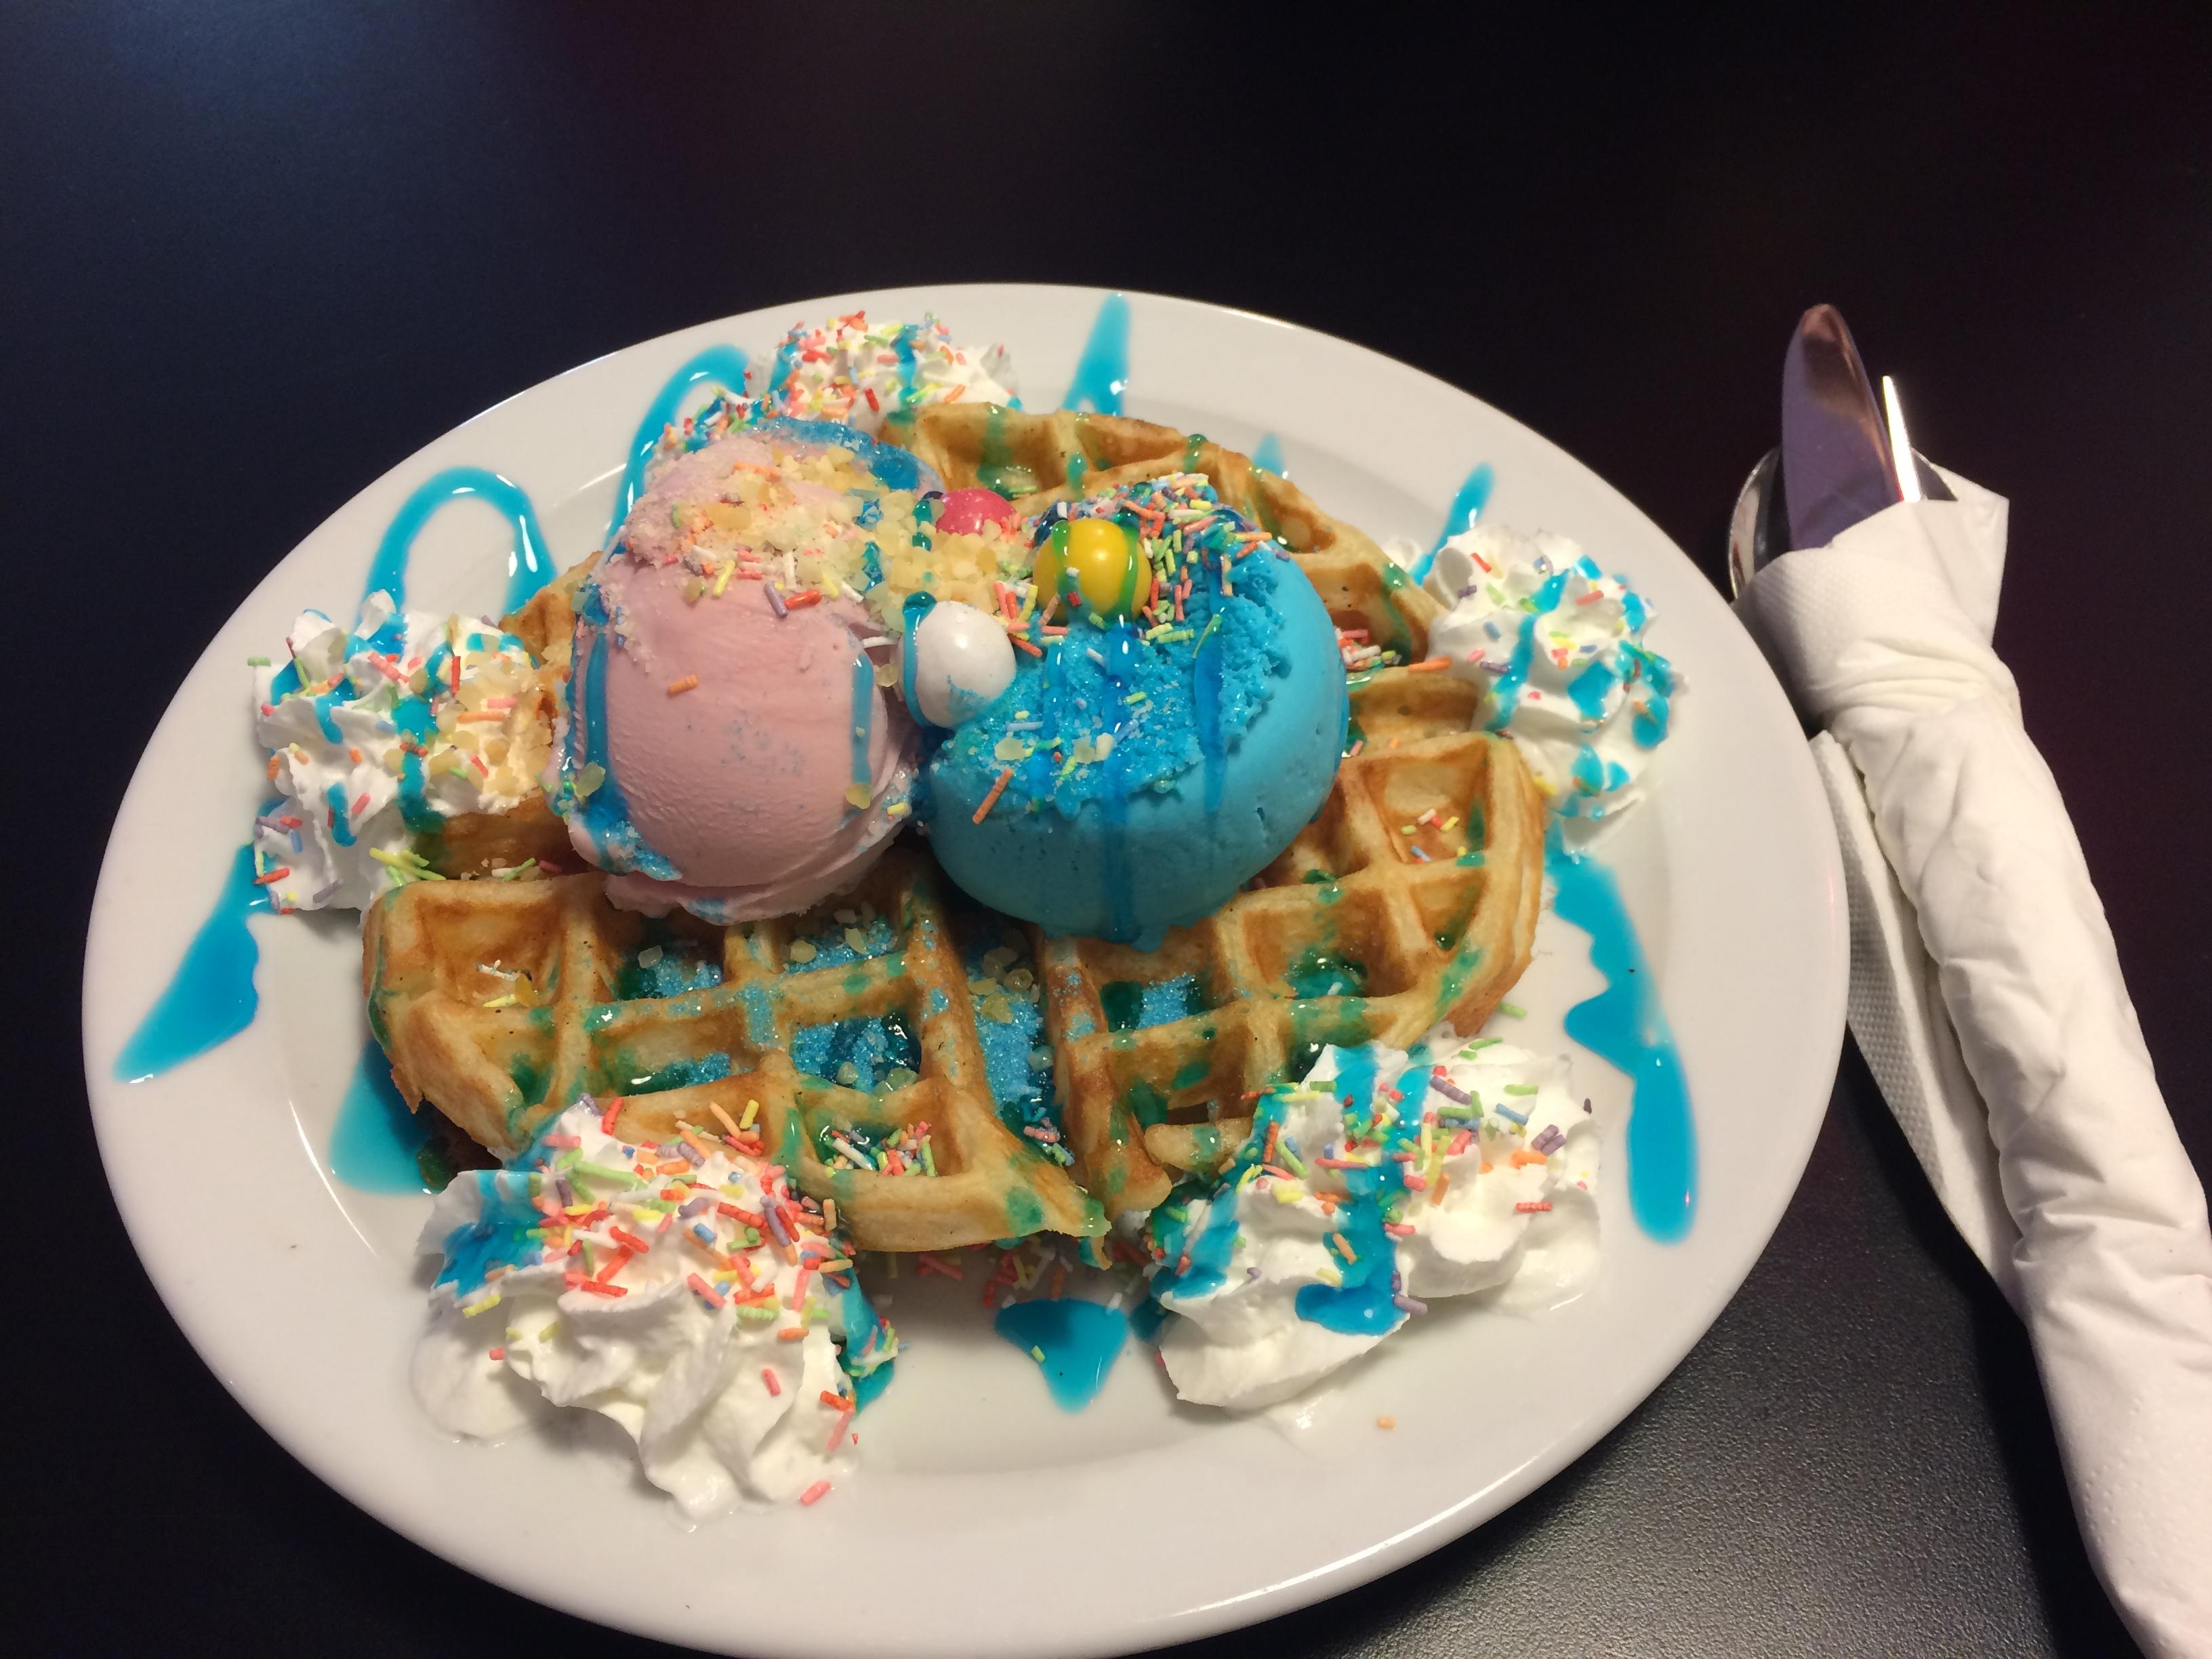 Frenchies Dessert Parlour 2015